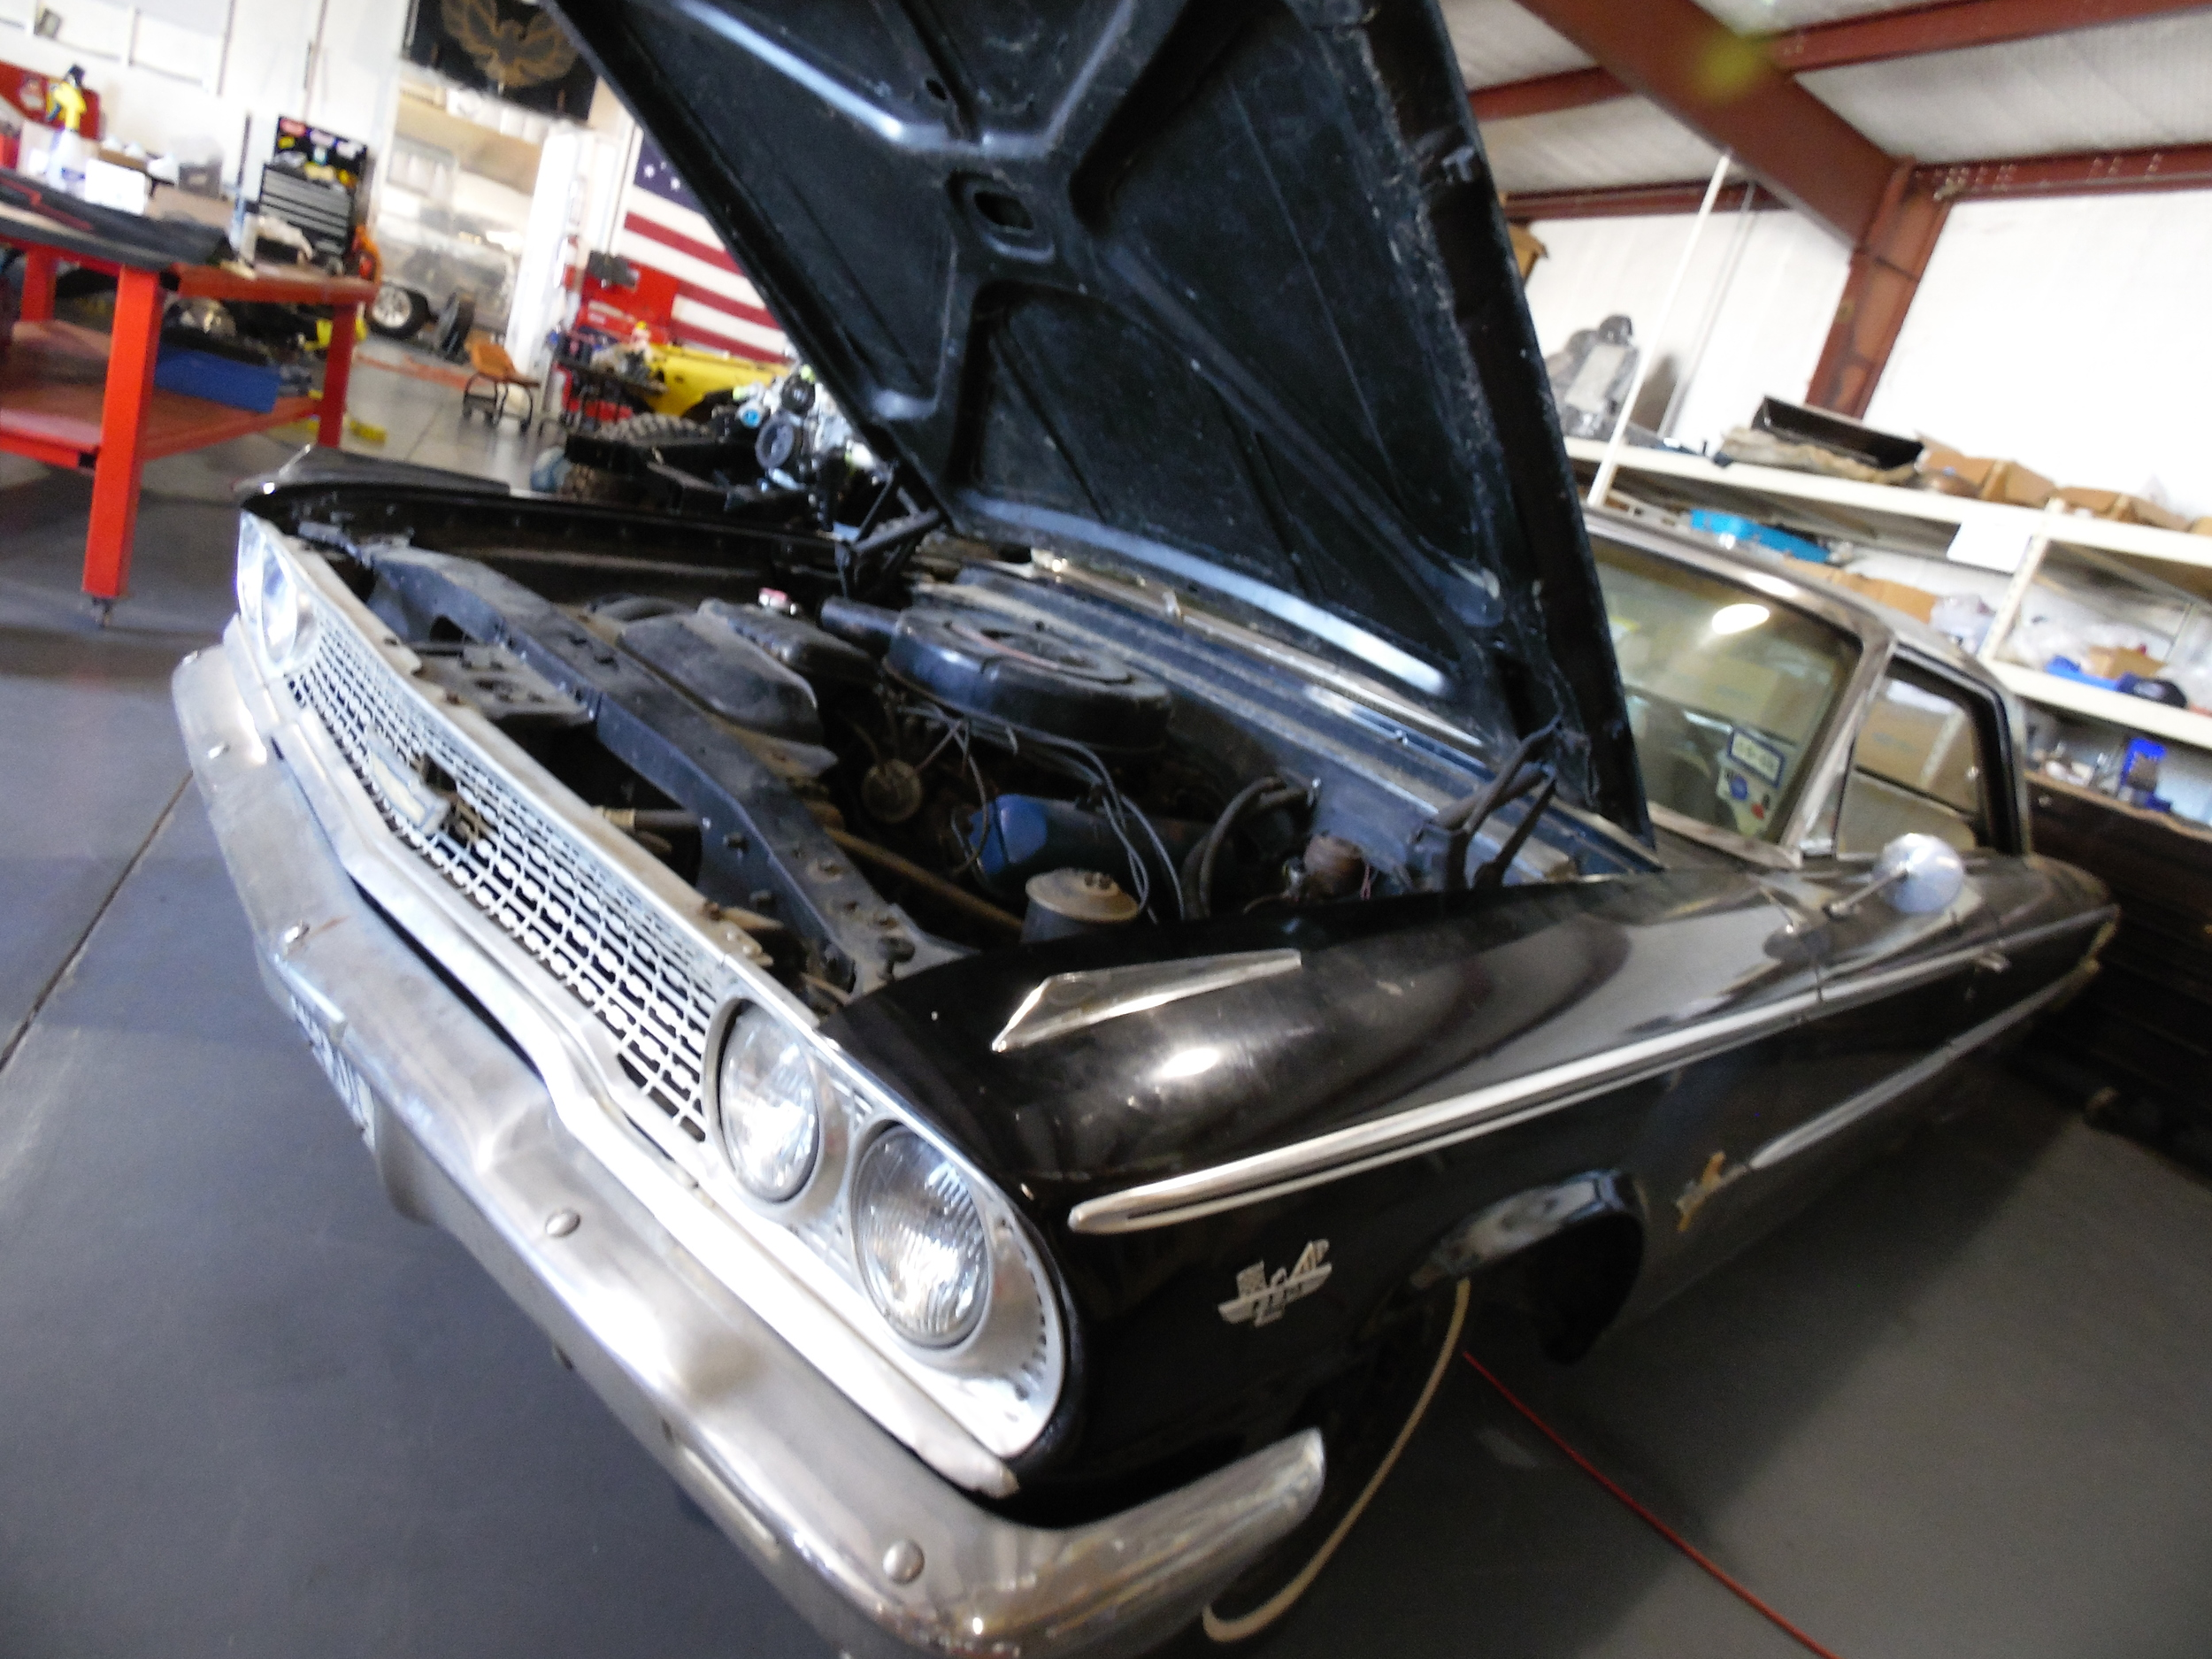 Ford Galaxie in shop